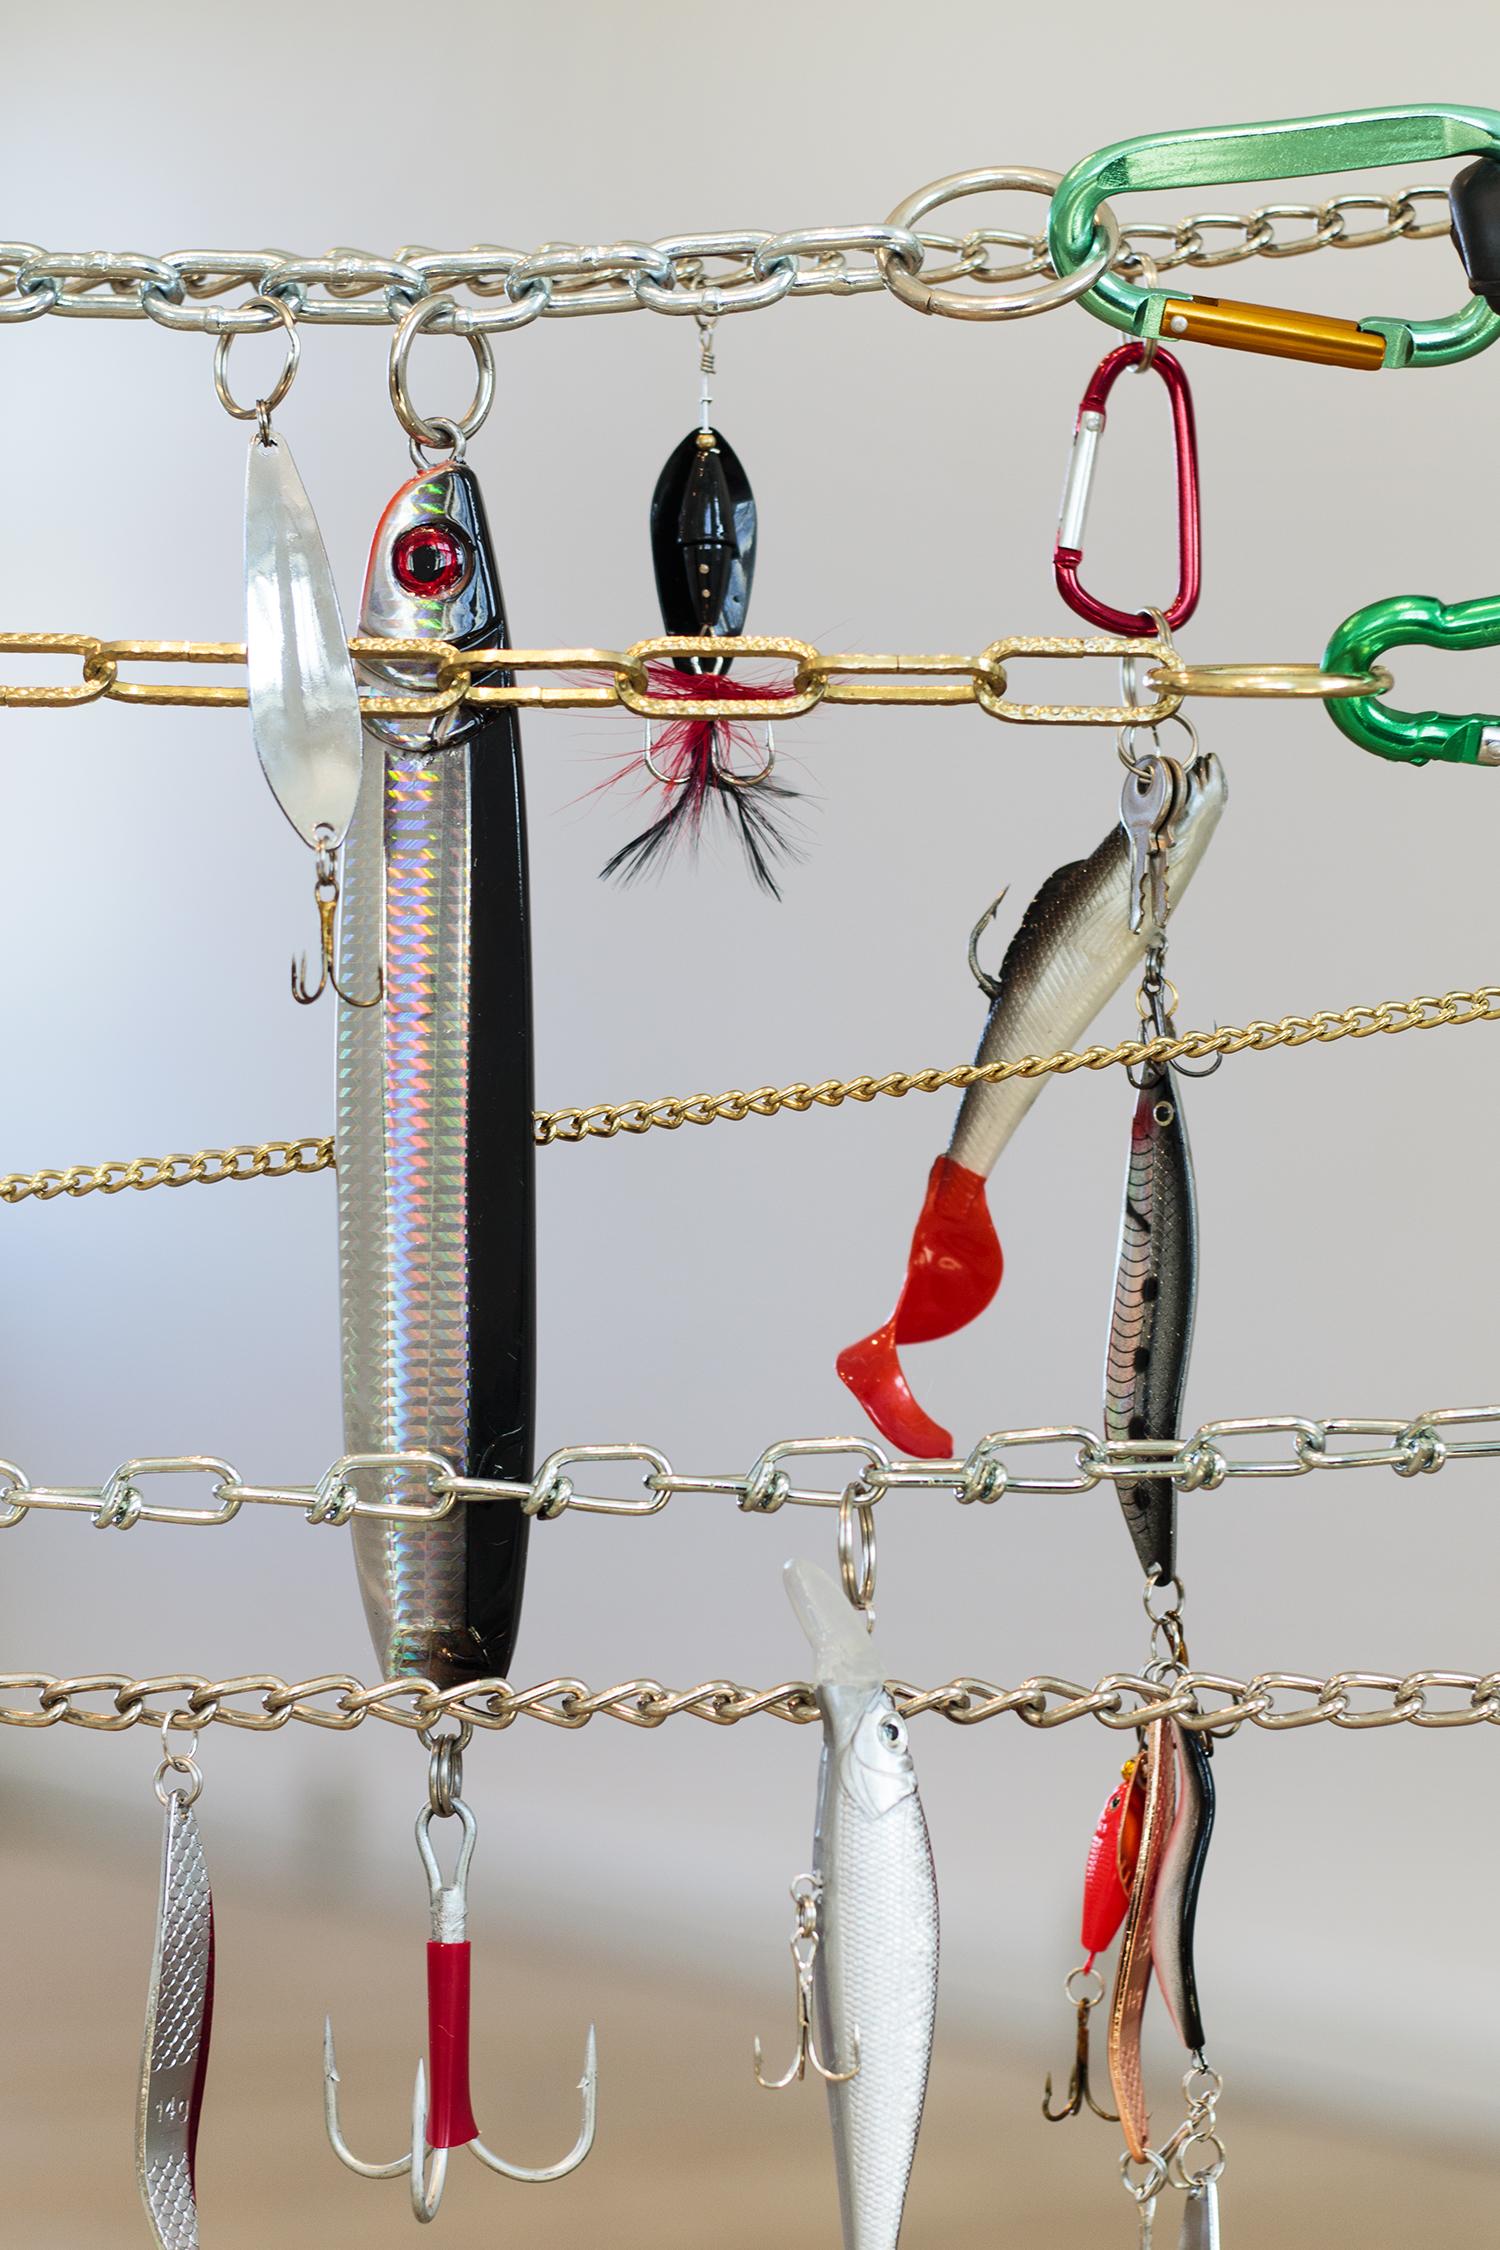 Maiken Bent, Swing #2 (detalje)   Foto: Rikke Luna & Matias © I DO ART Agency.